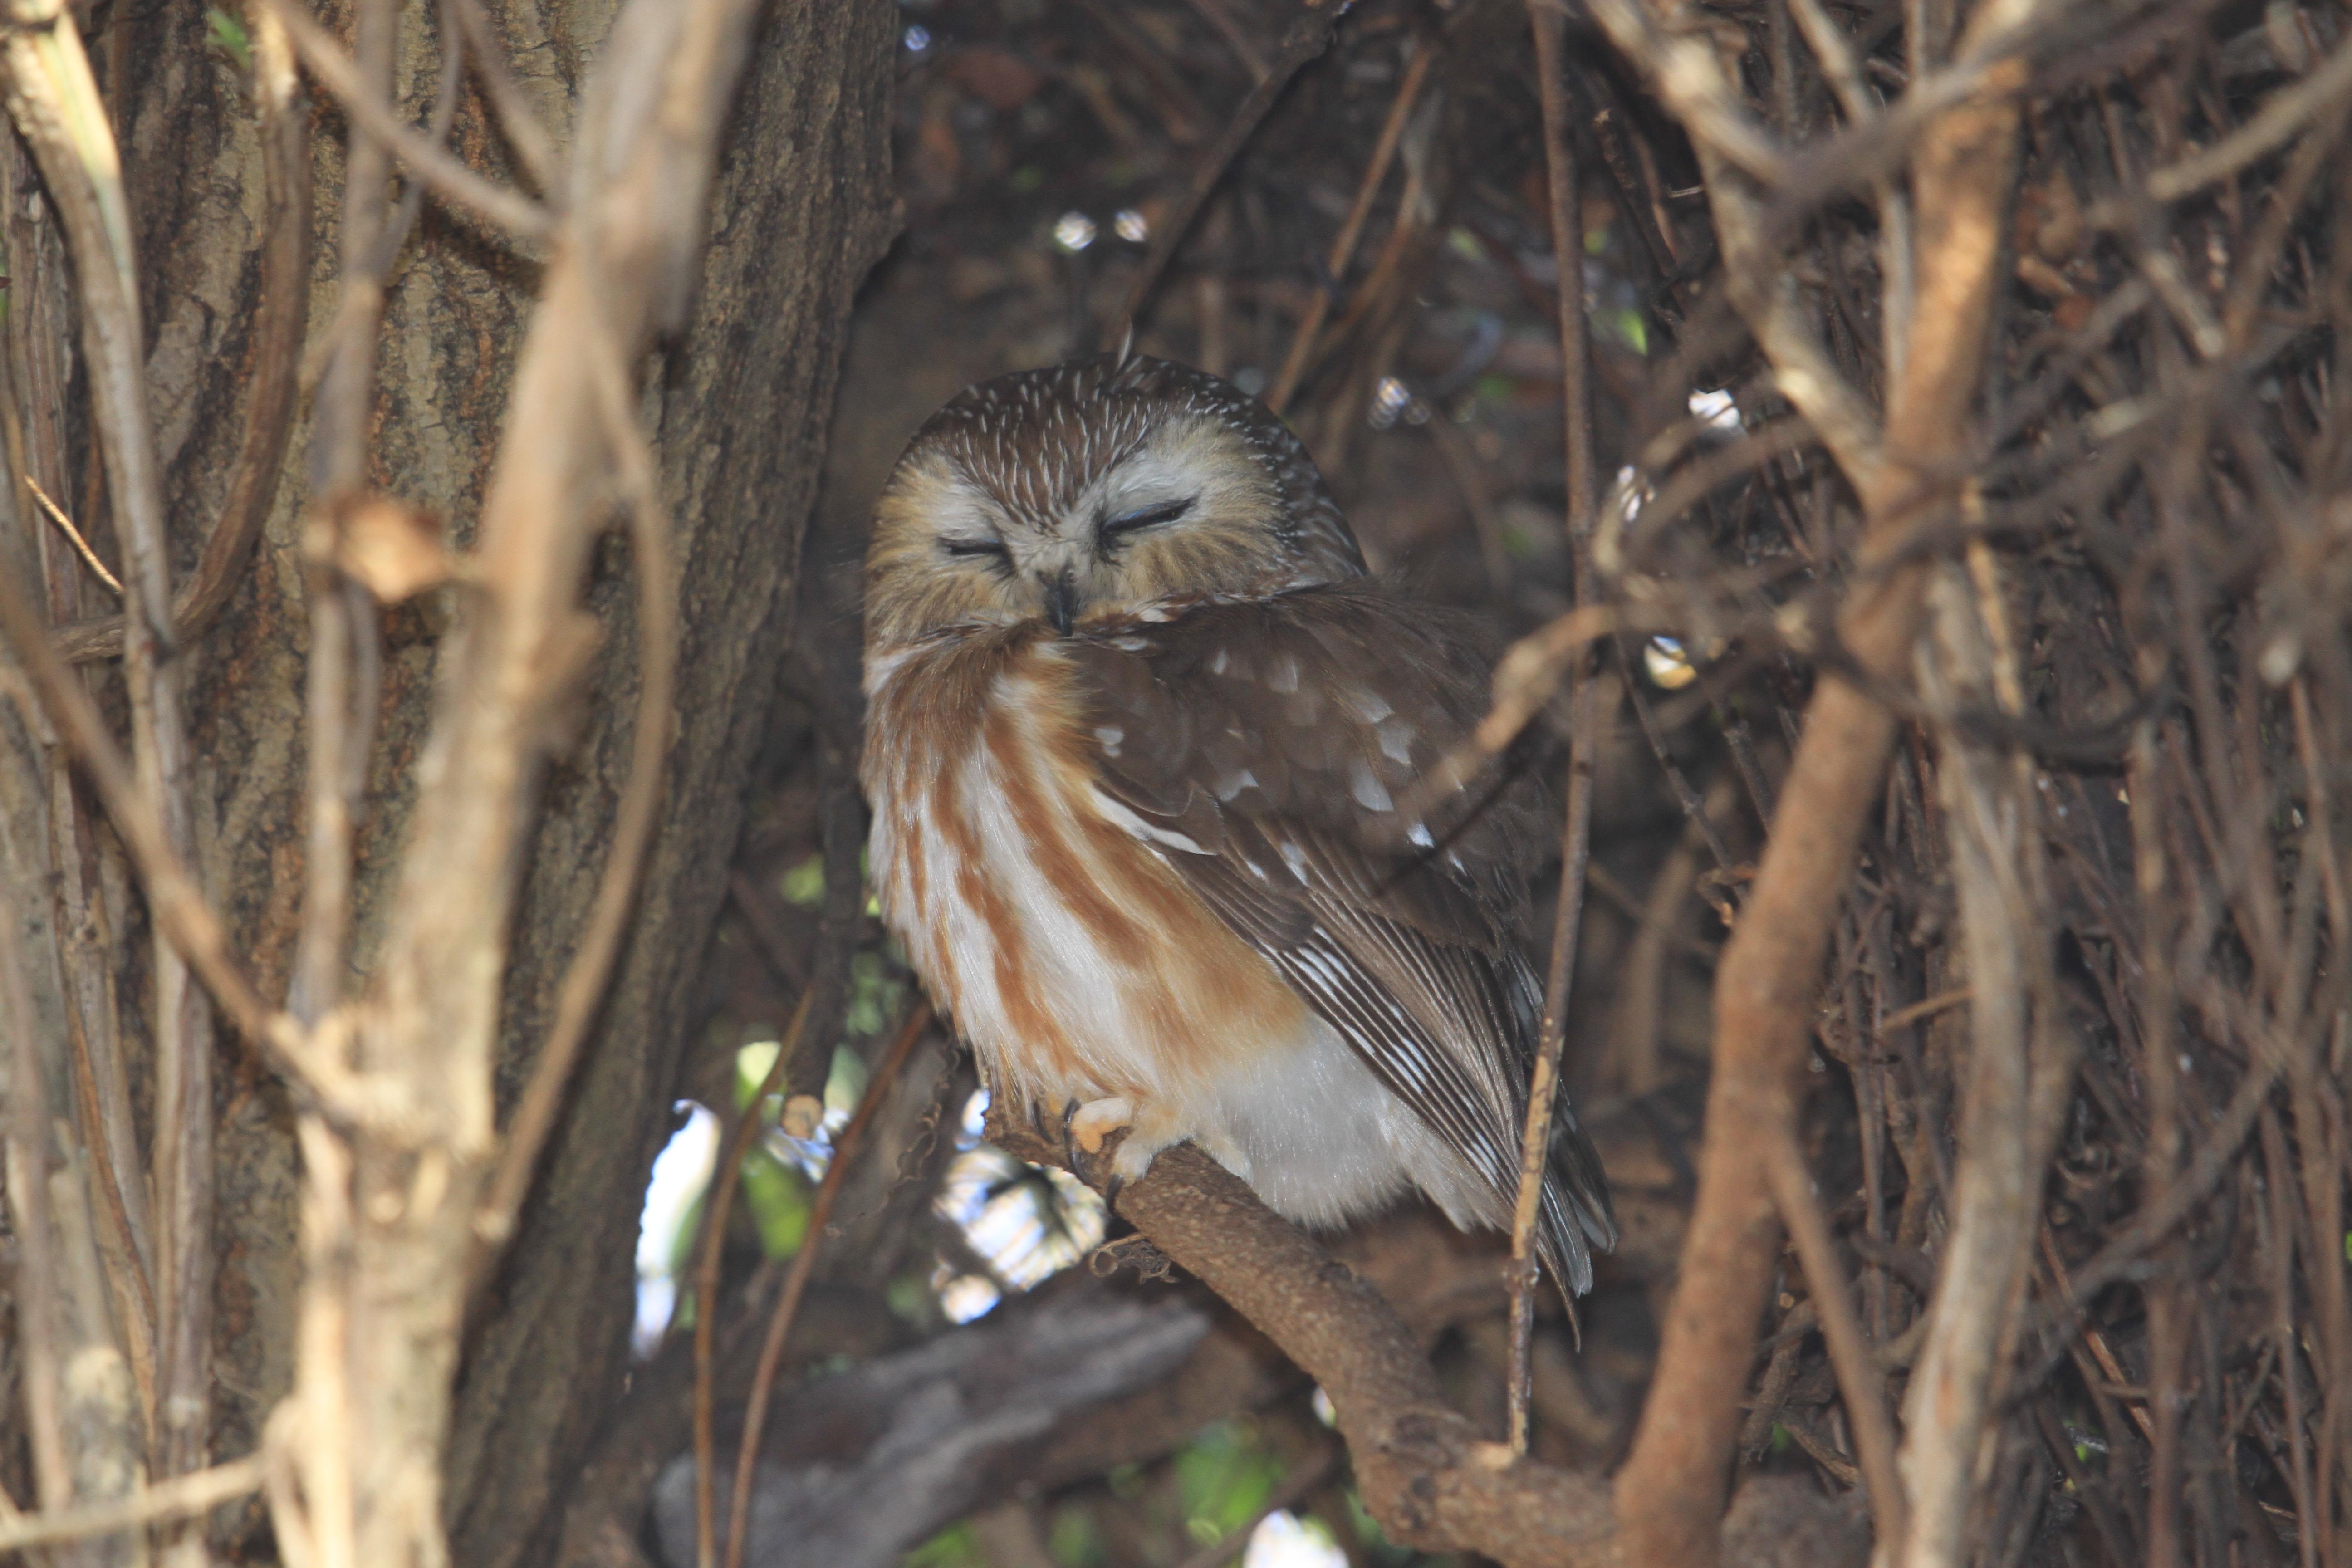 Northern Saw-whet Owl roosting in shrub.  Photo by Adrian Binns.